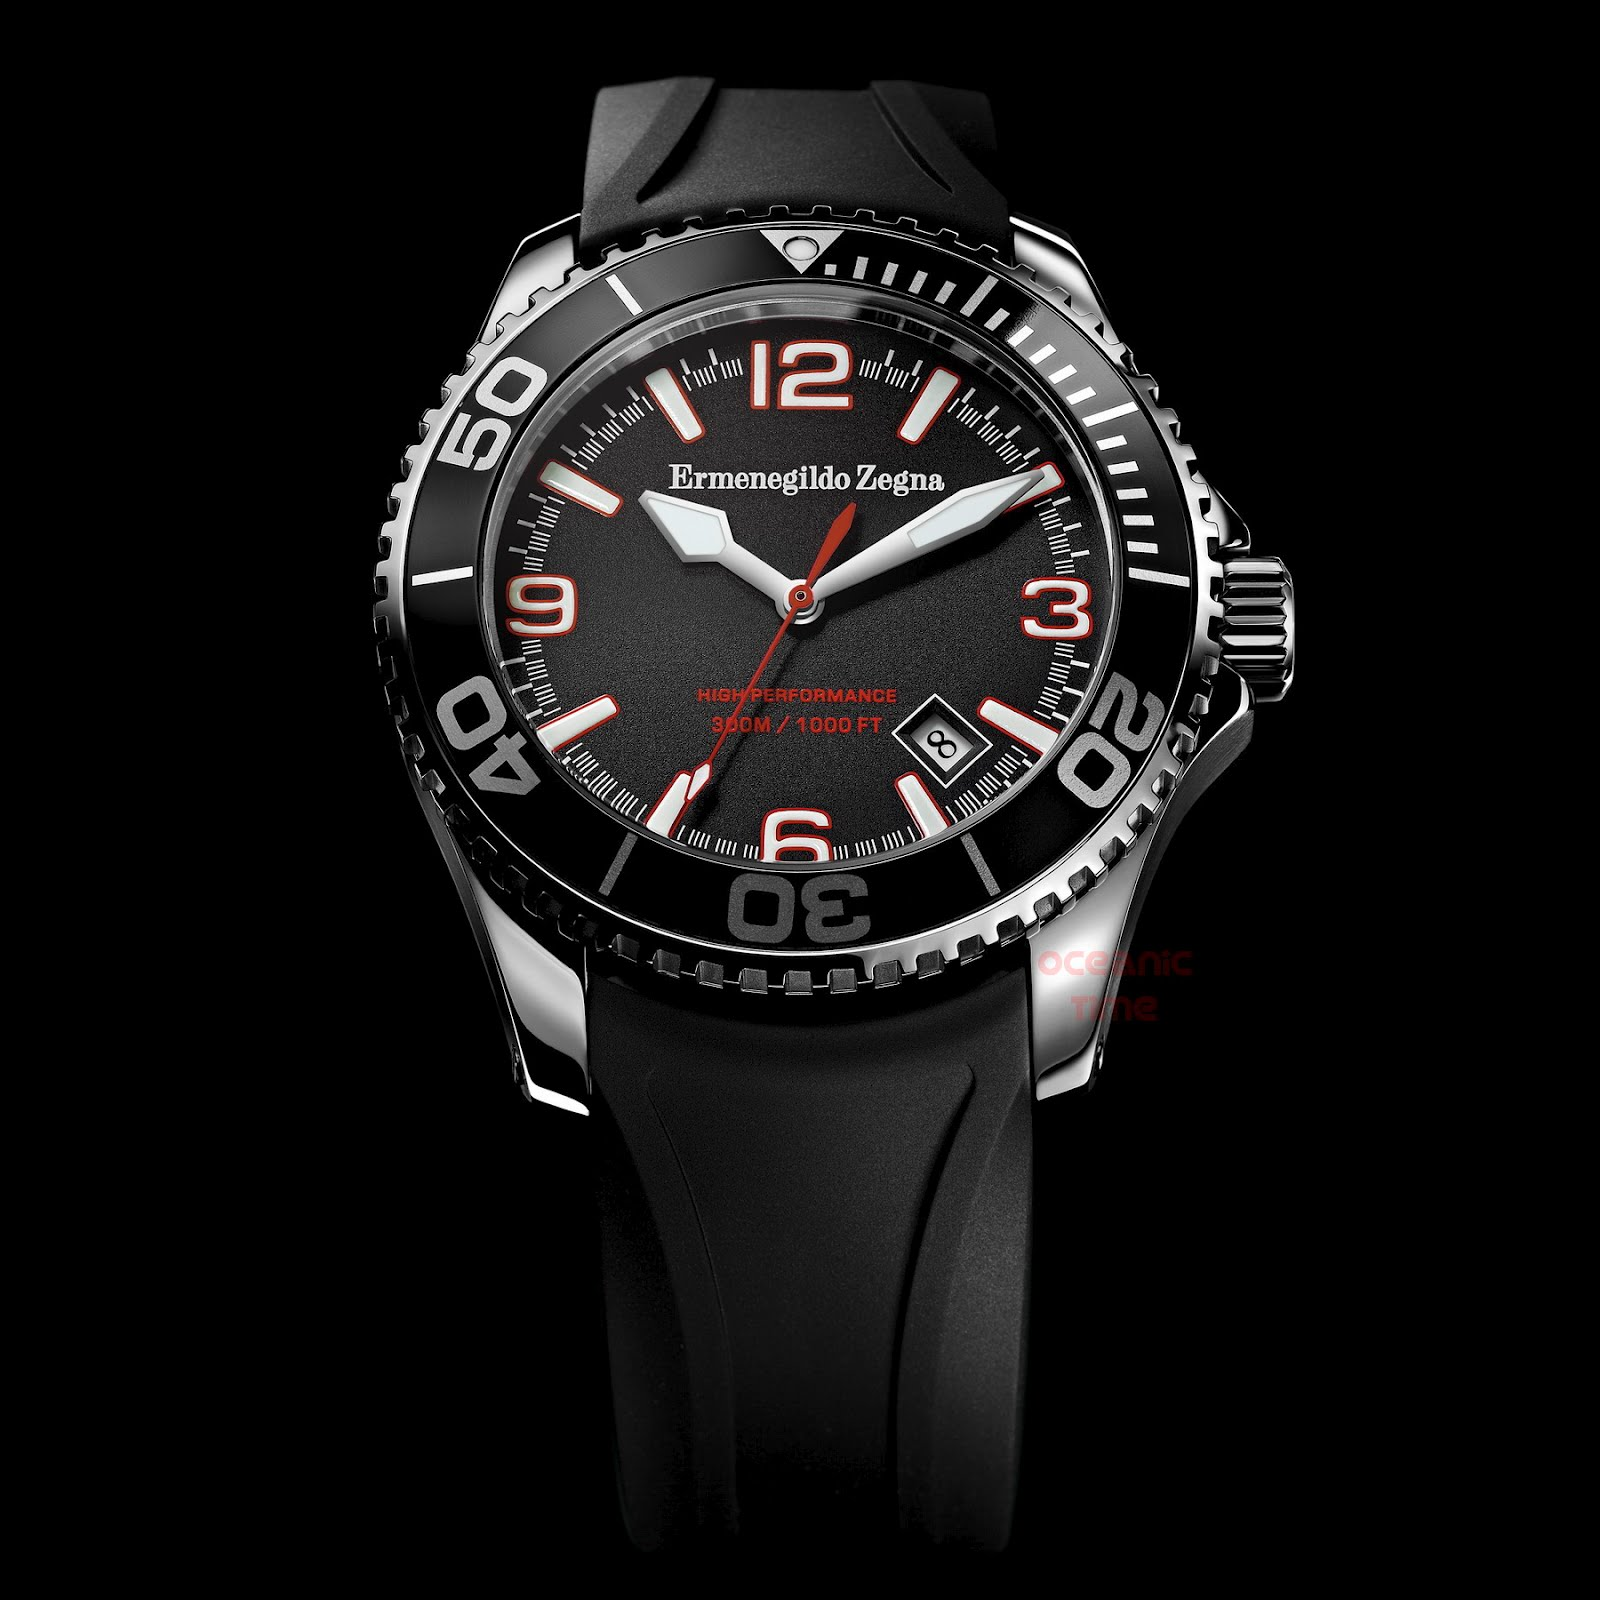 zegna high performance sea diver